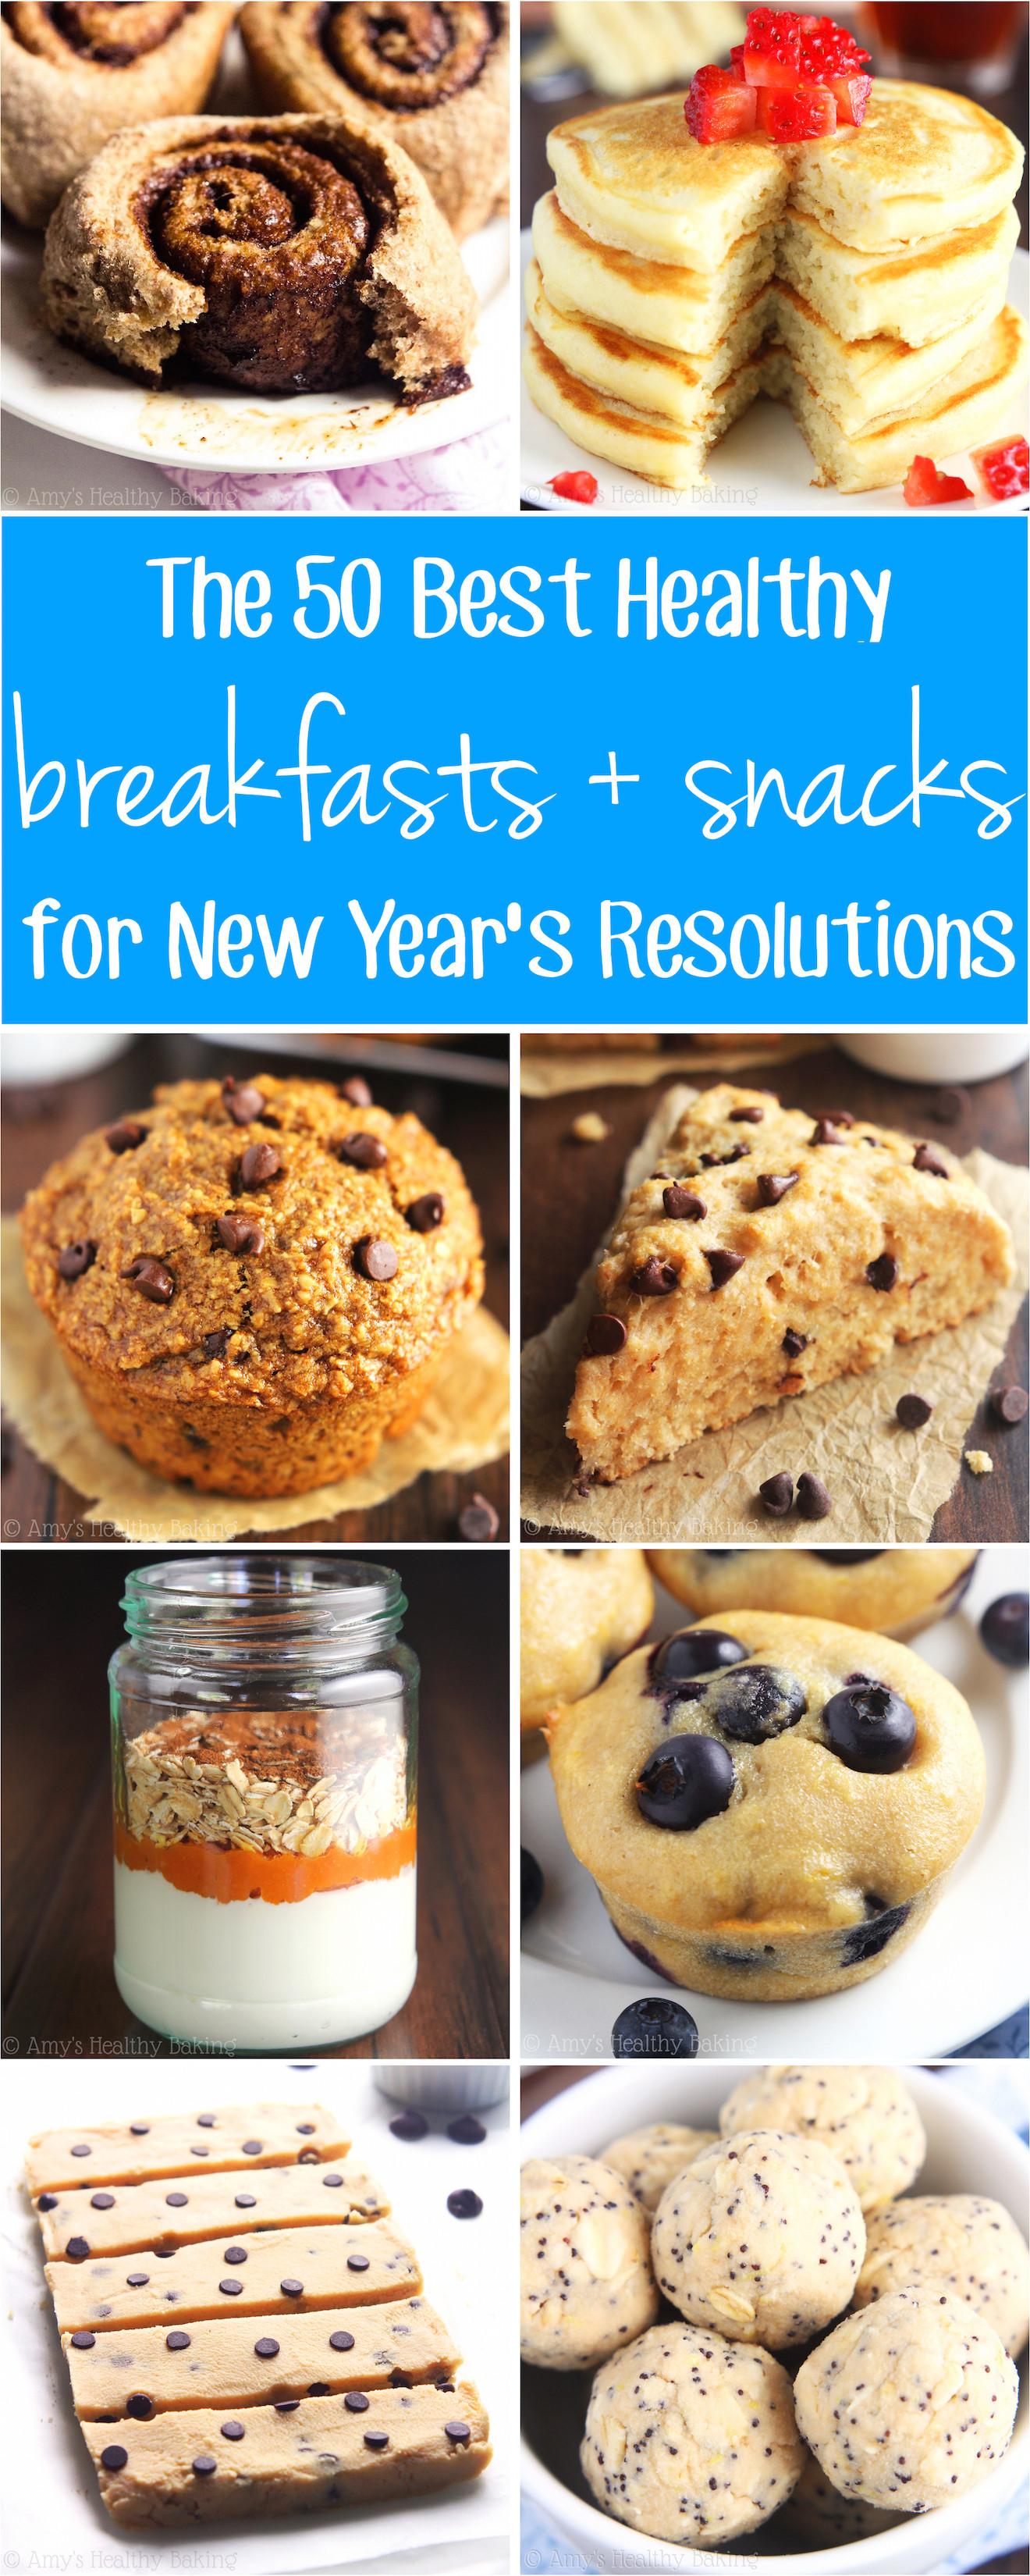 Healthy Breakfast For Group  The 50 Best Healthy Breakfasts & Snacks